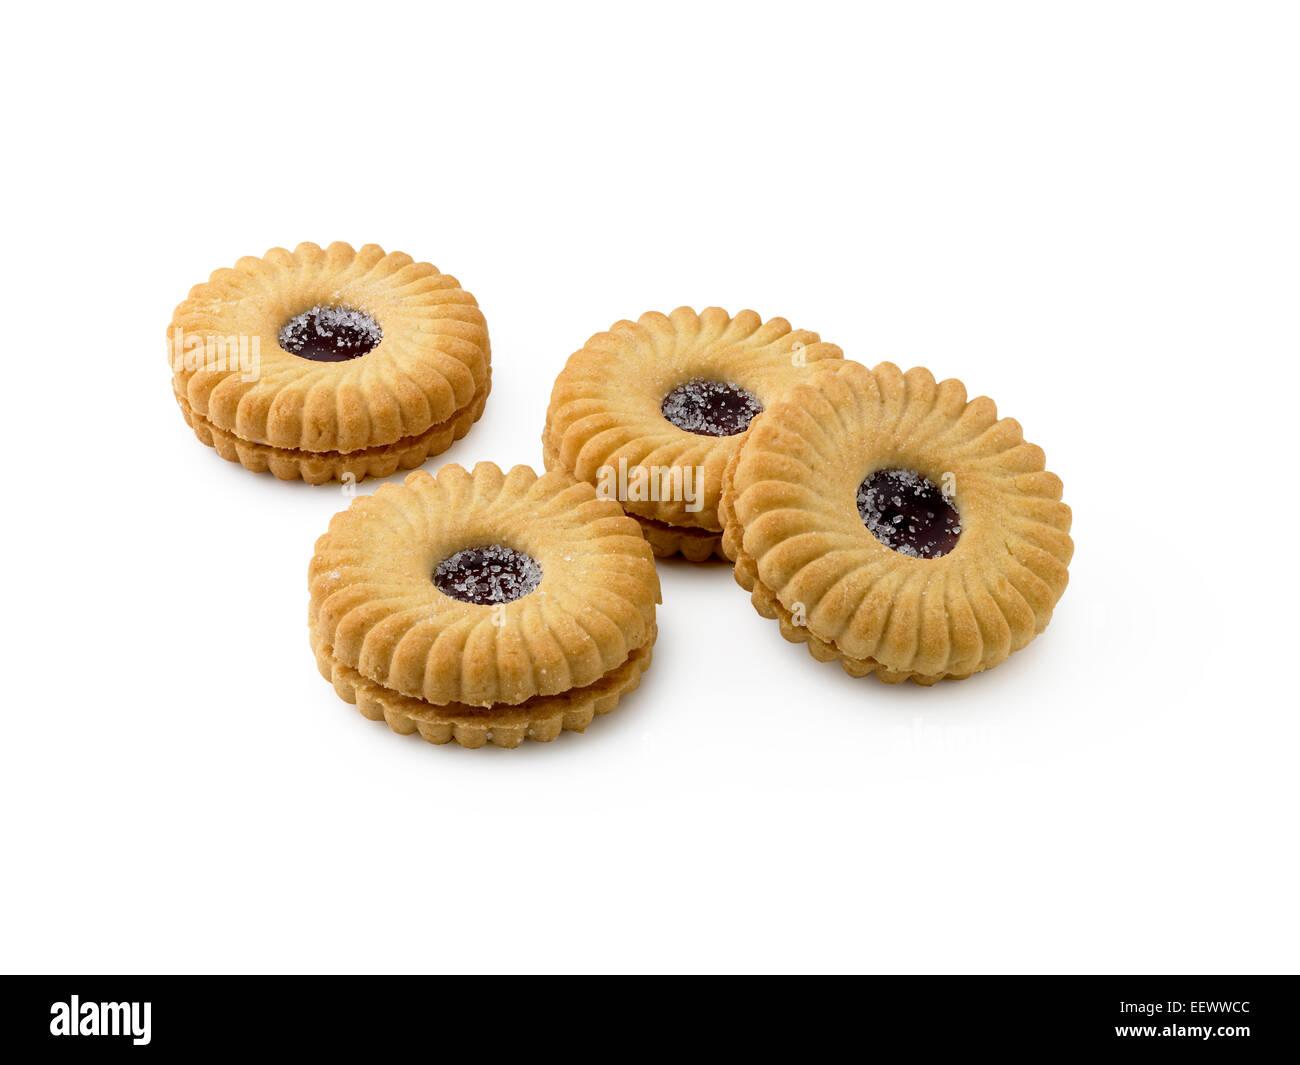 jammy dodger biscuits - Stock Image